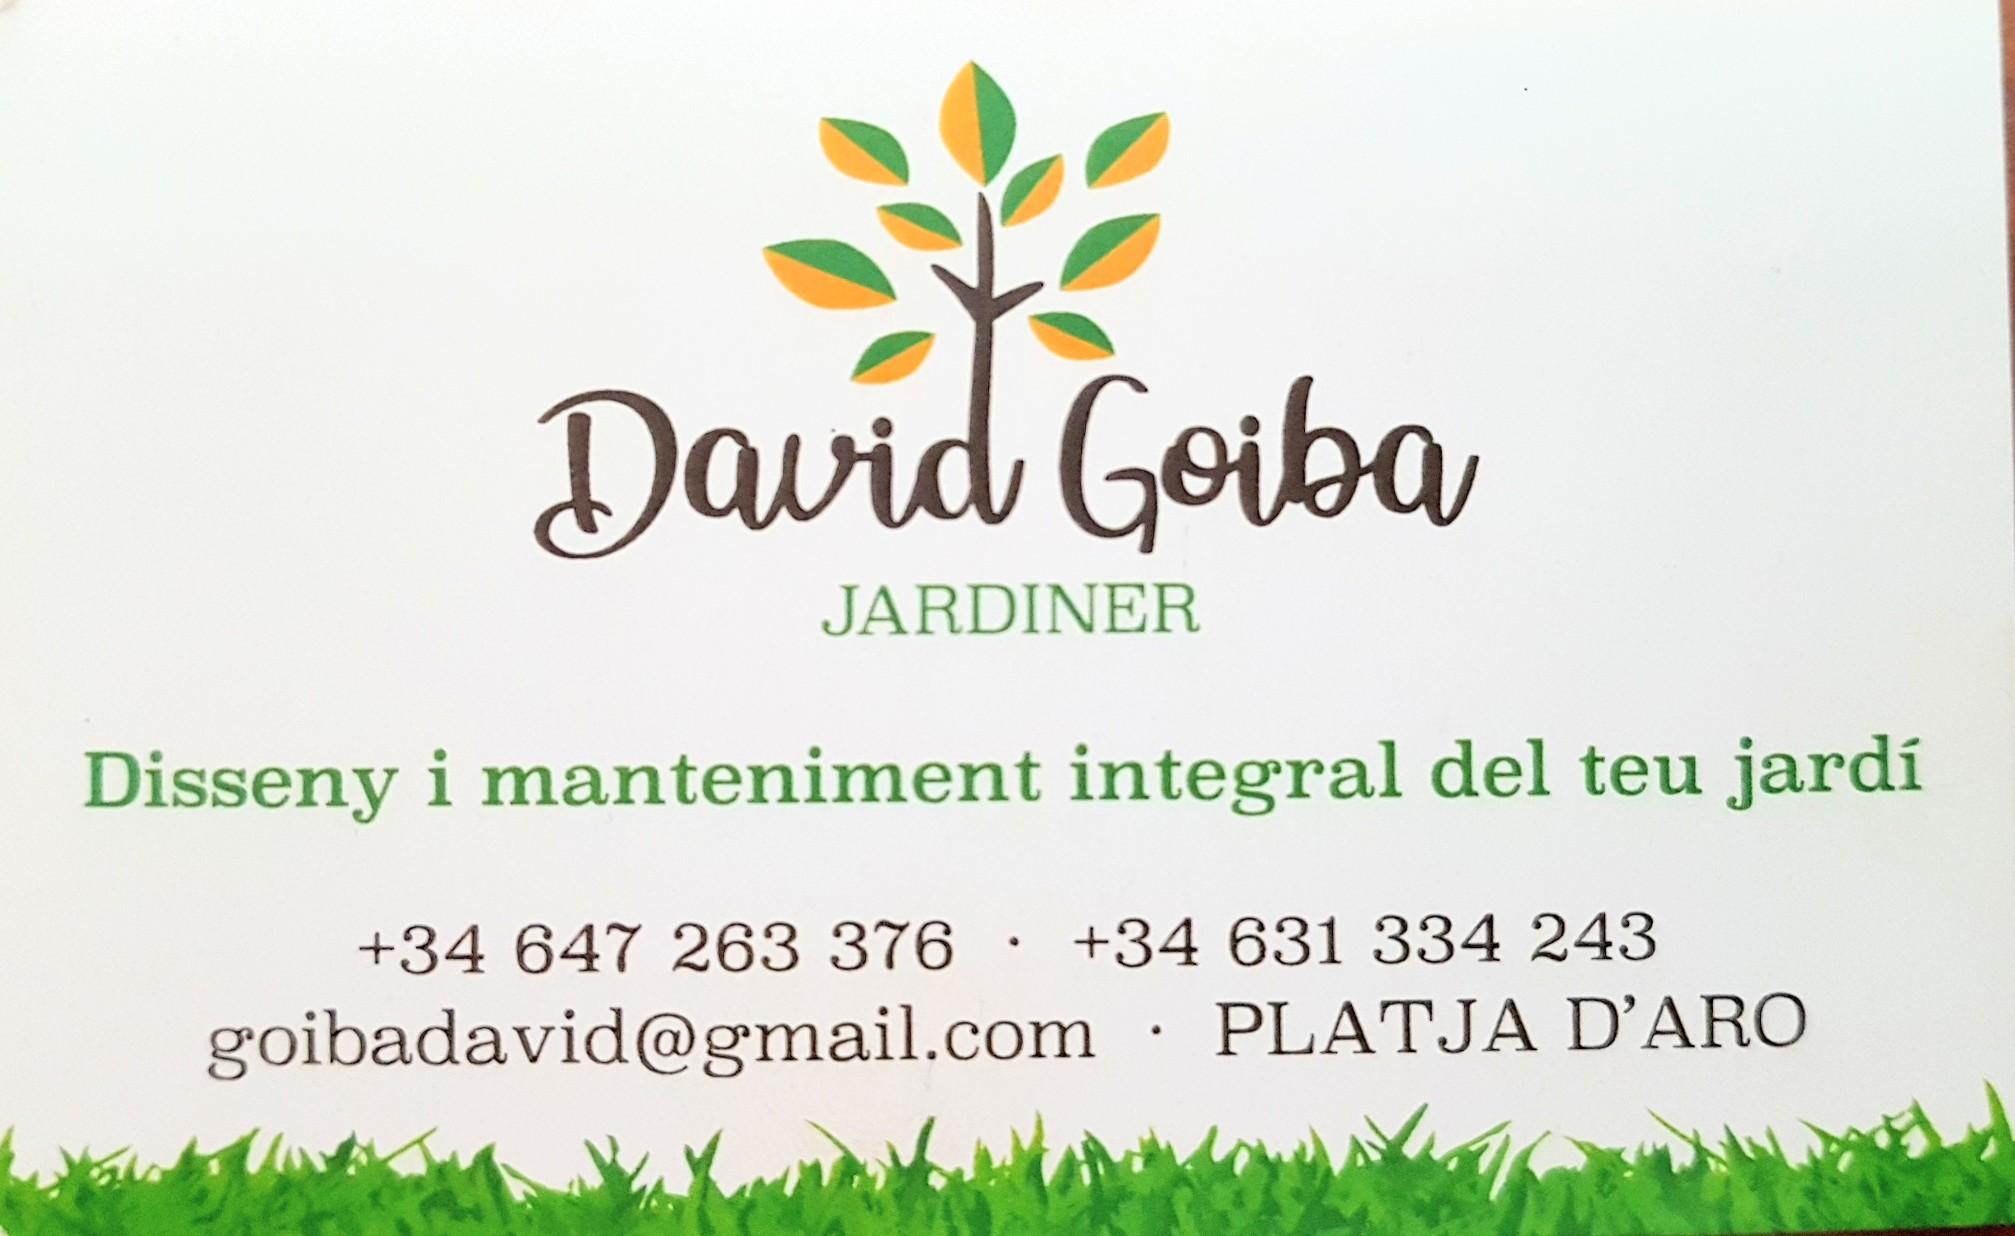 Jardiner David Goiba